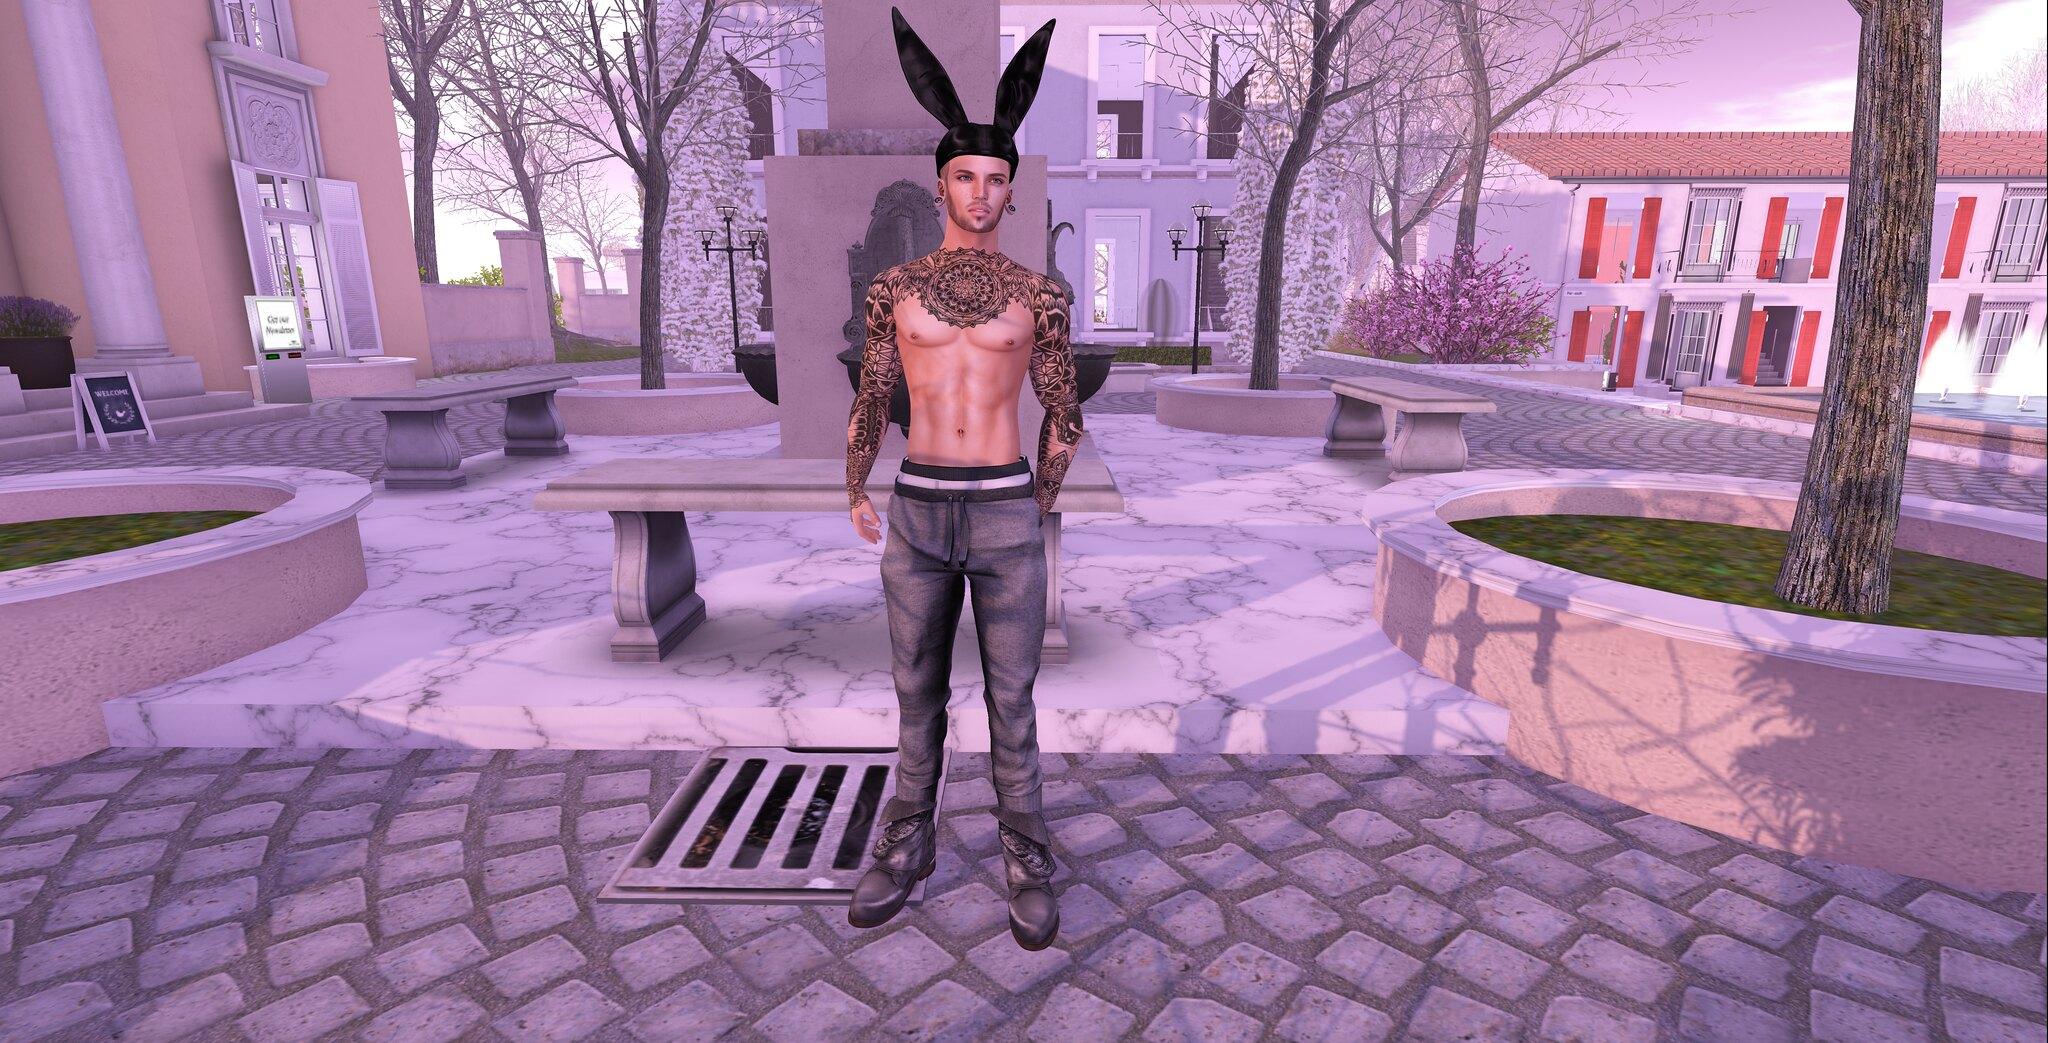 Play me like a playboy bunny